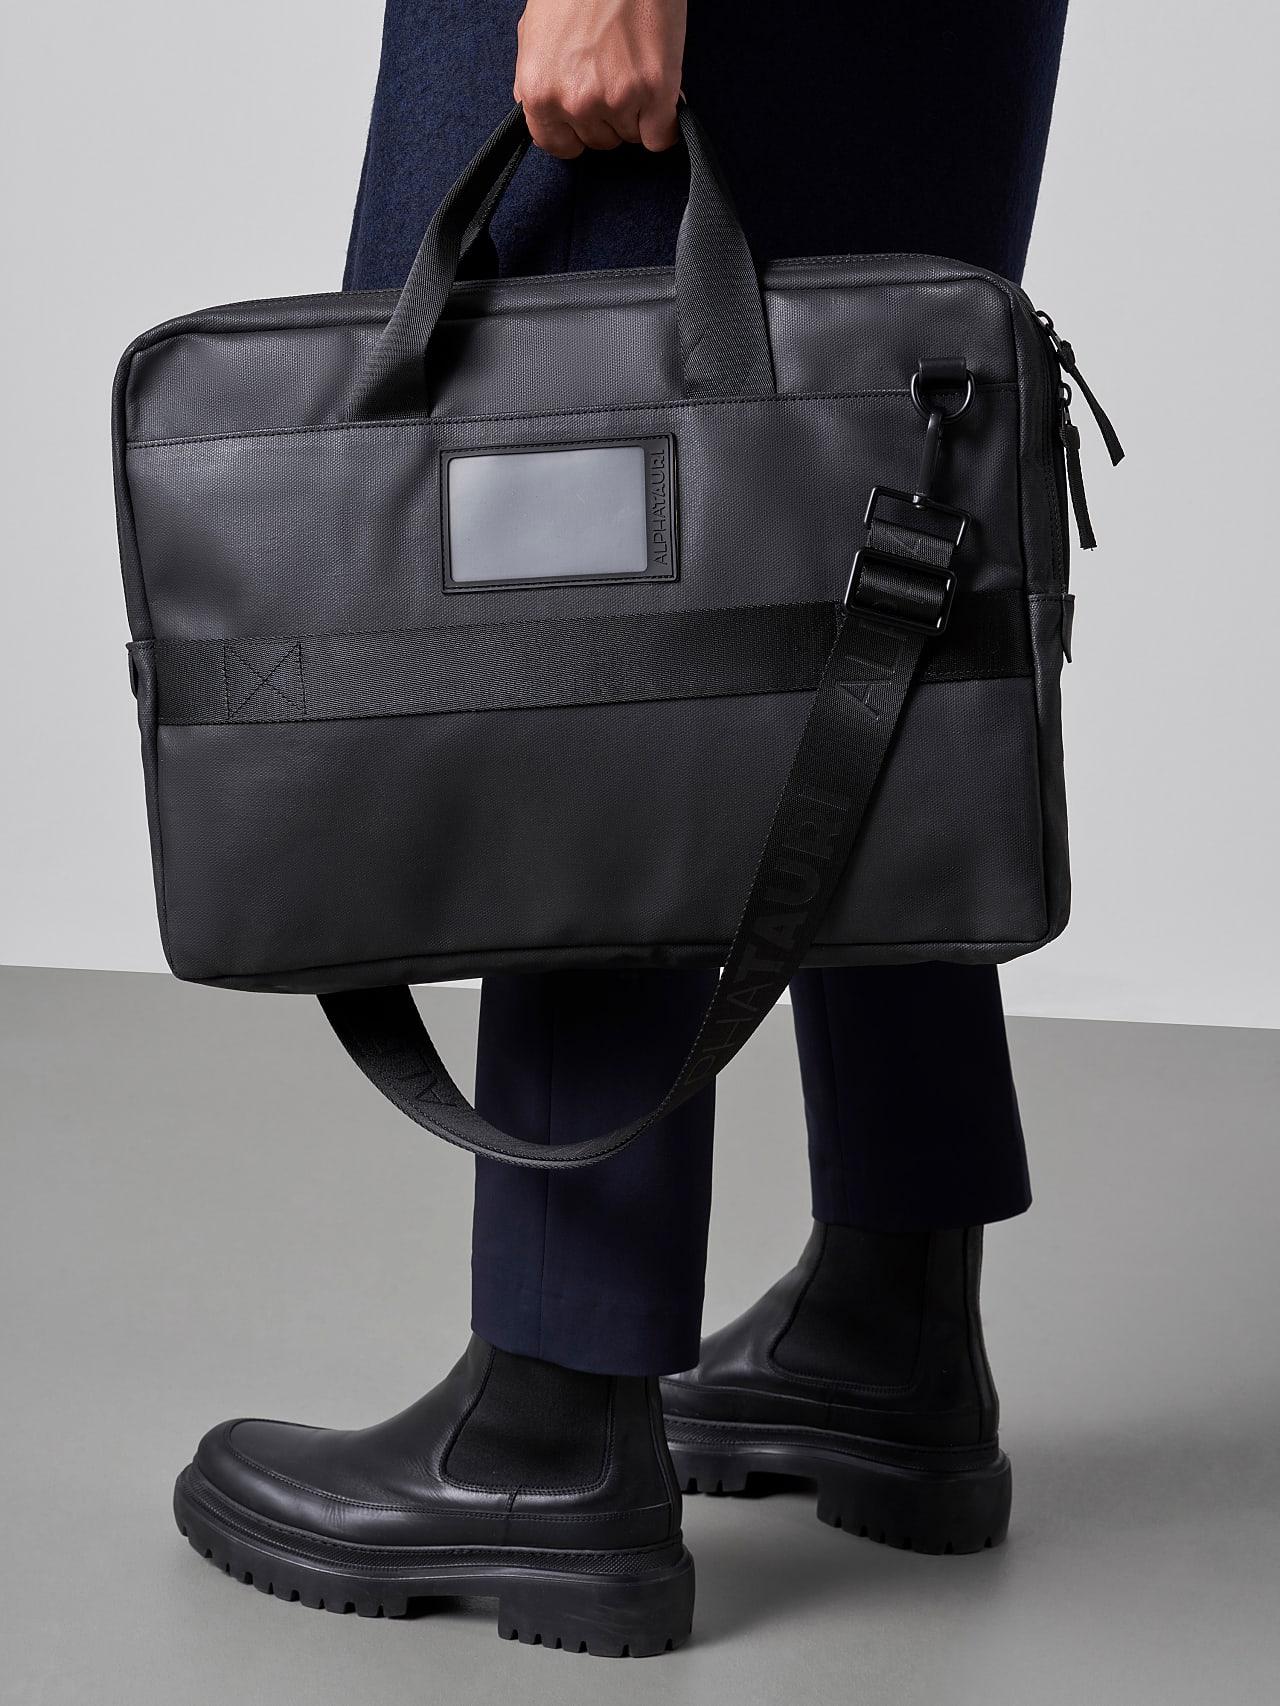 ABELO V1.Y5.02 Leather Laptop Bag dark grey / anthracite Front Main Alpha Tauri